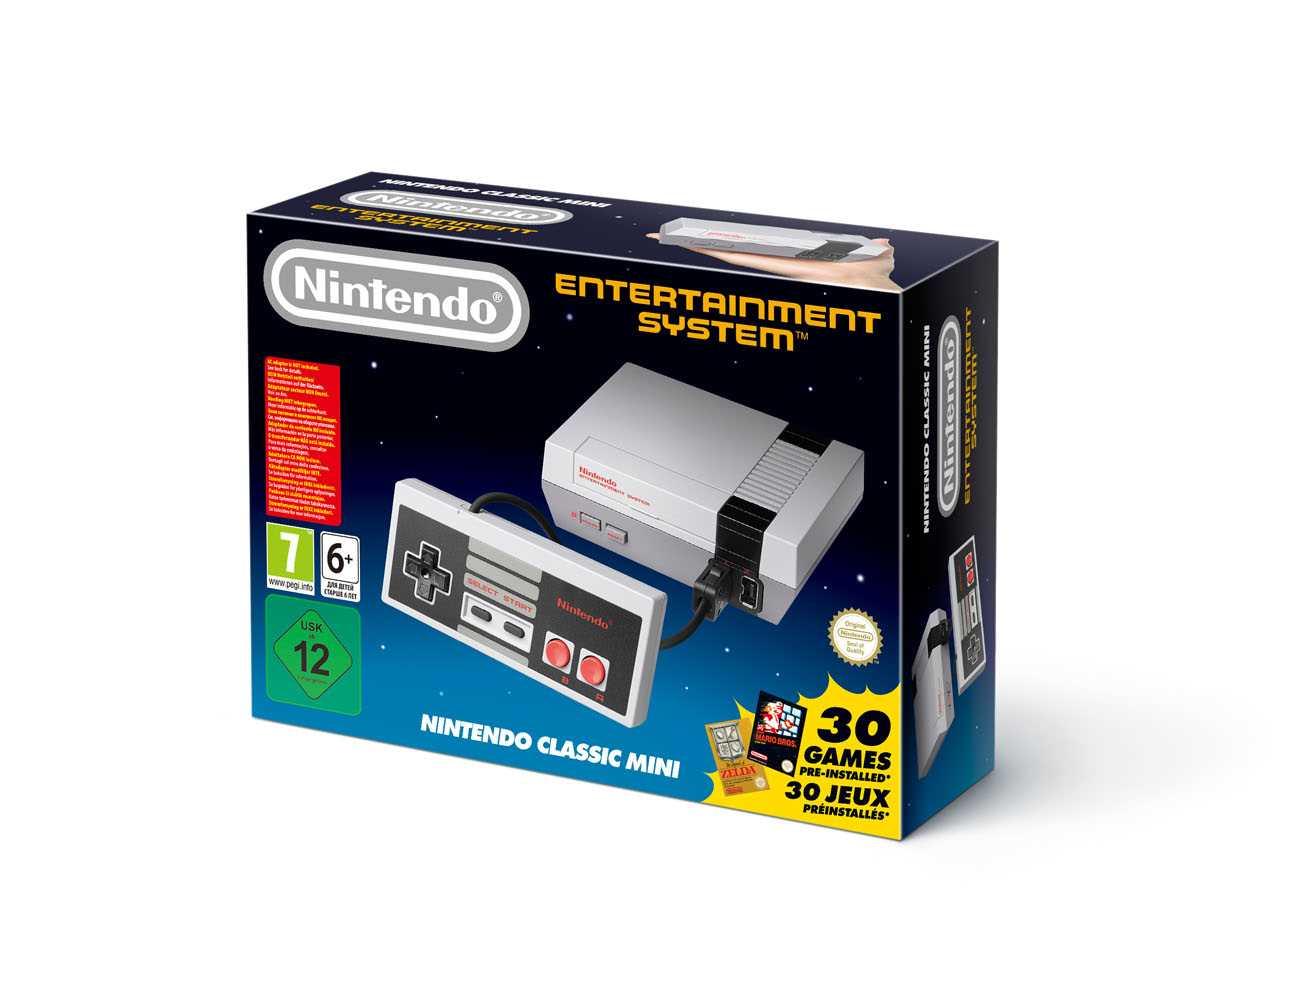 NES Classic Mini box